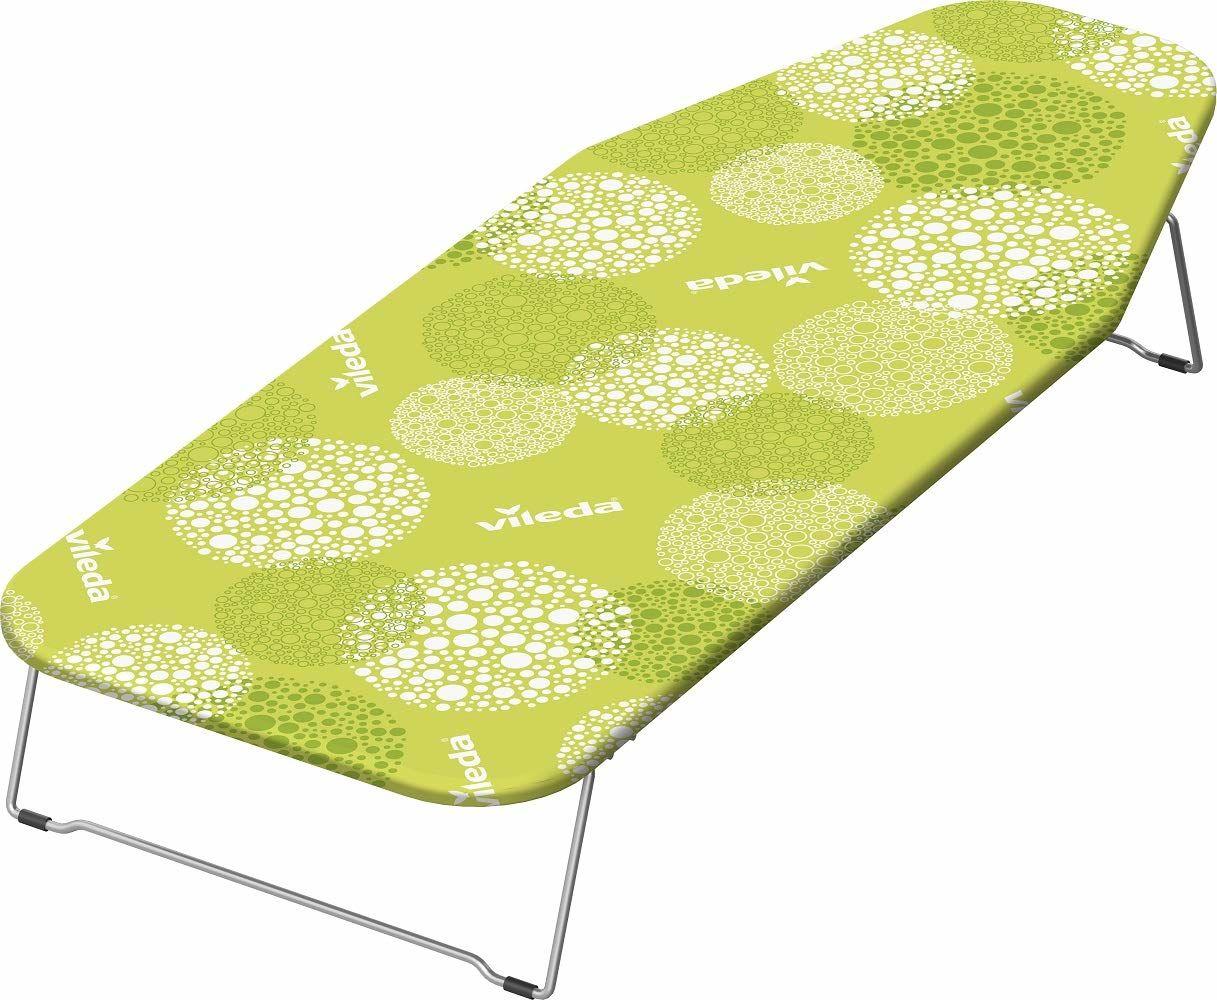 Vileda Carino deska do prasowania, metalowa, zielona, 100 x 38 cm